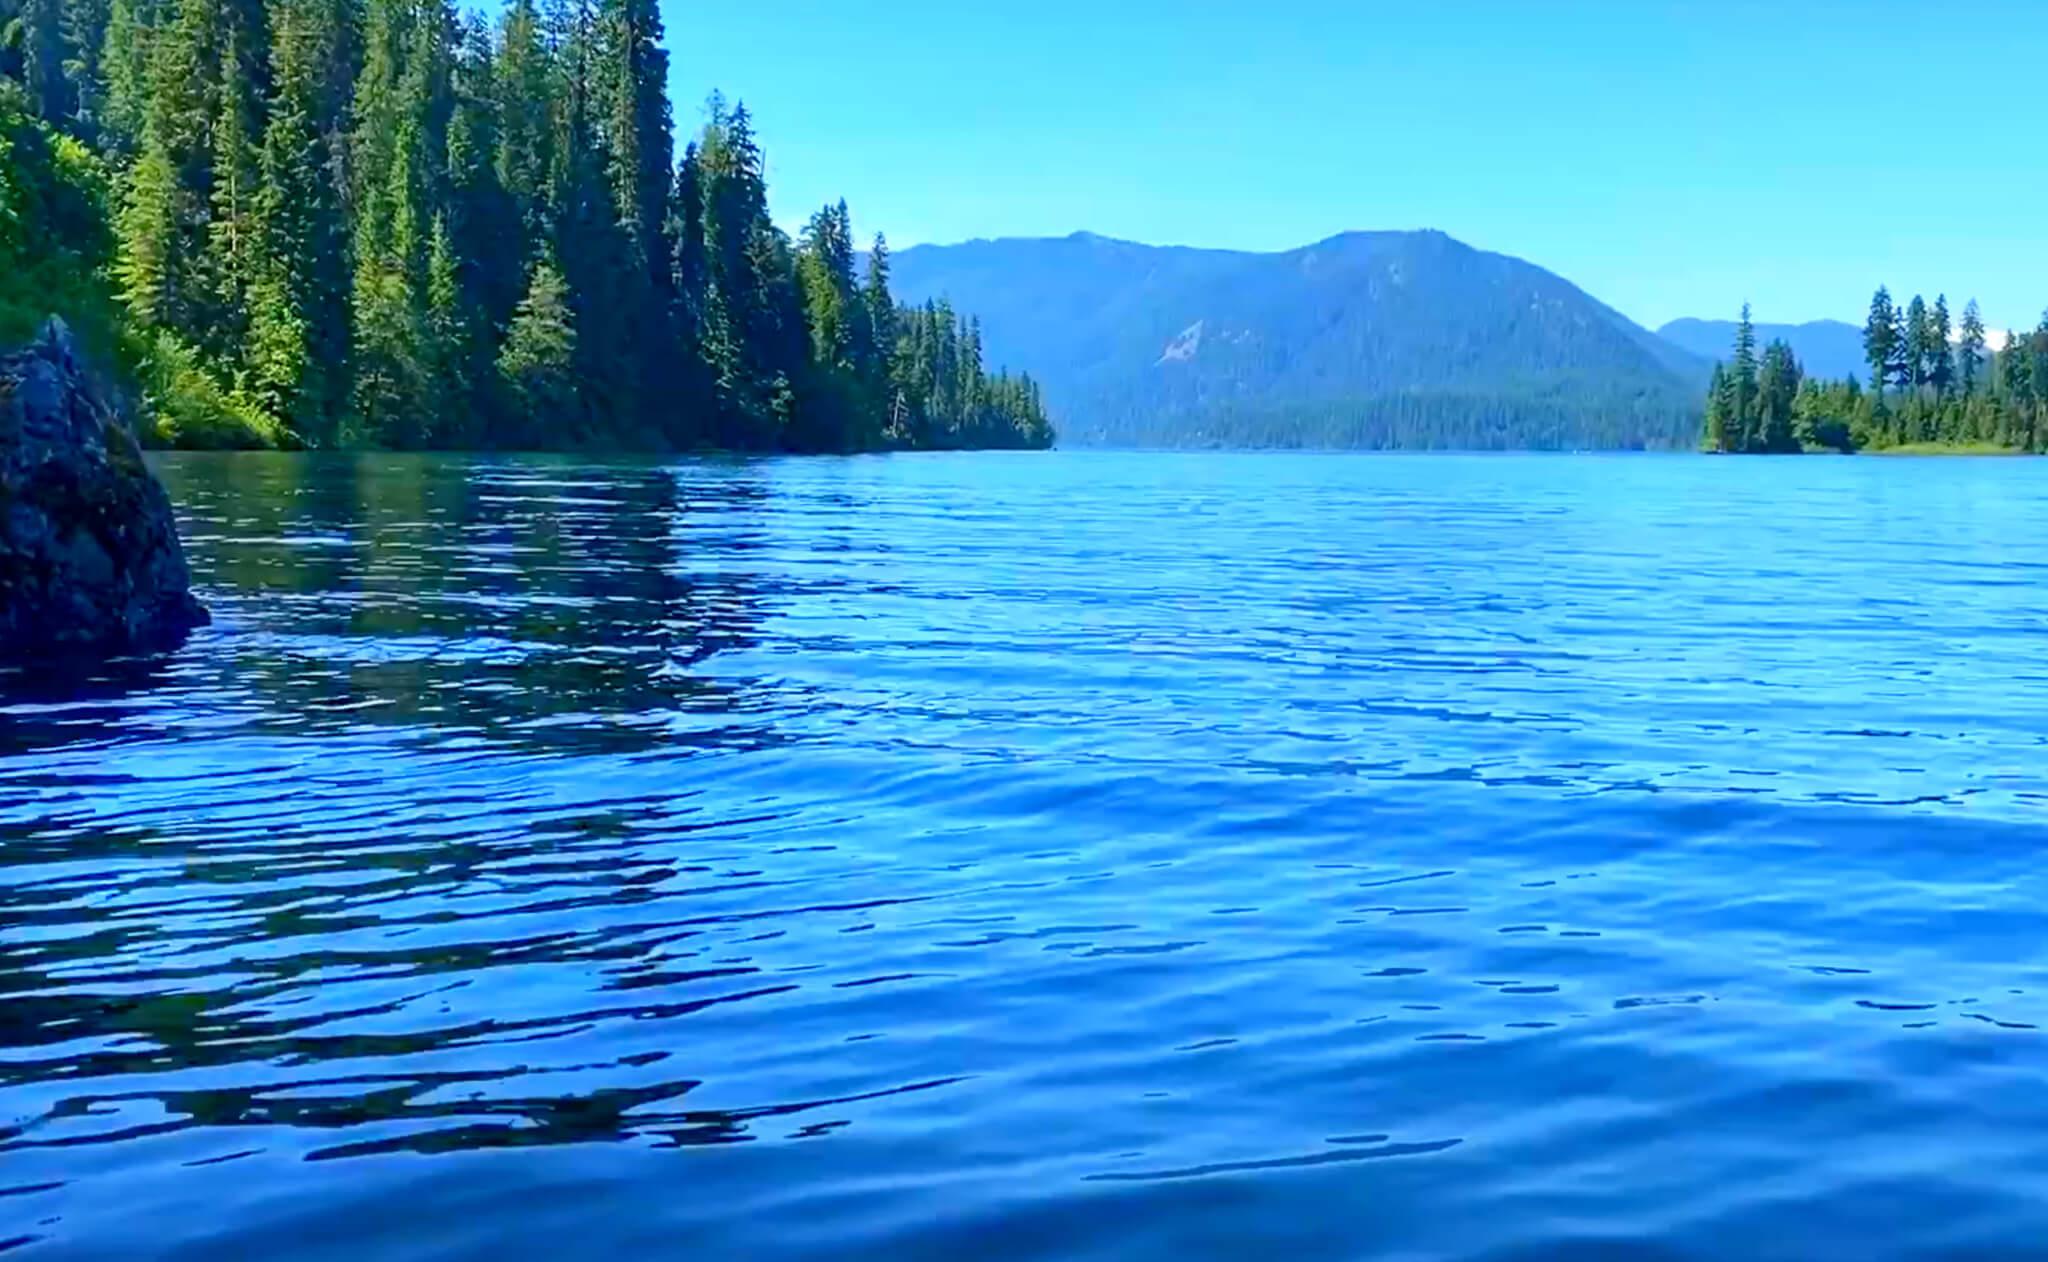 Kachess-Lake-Fishing-Report-Guide-Washington-WA-02